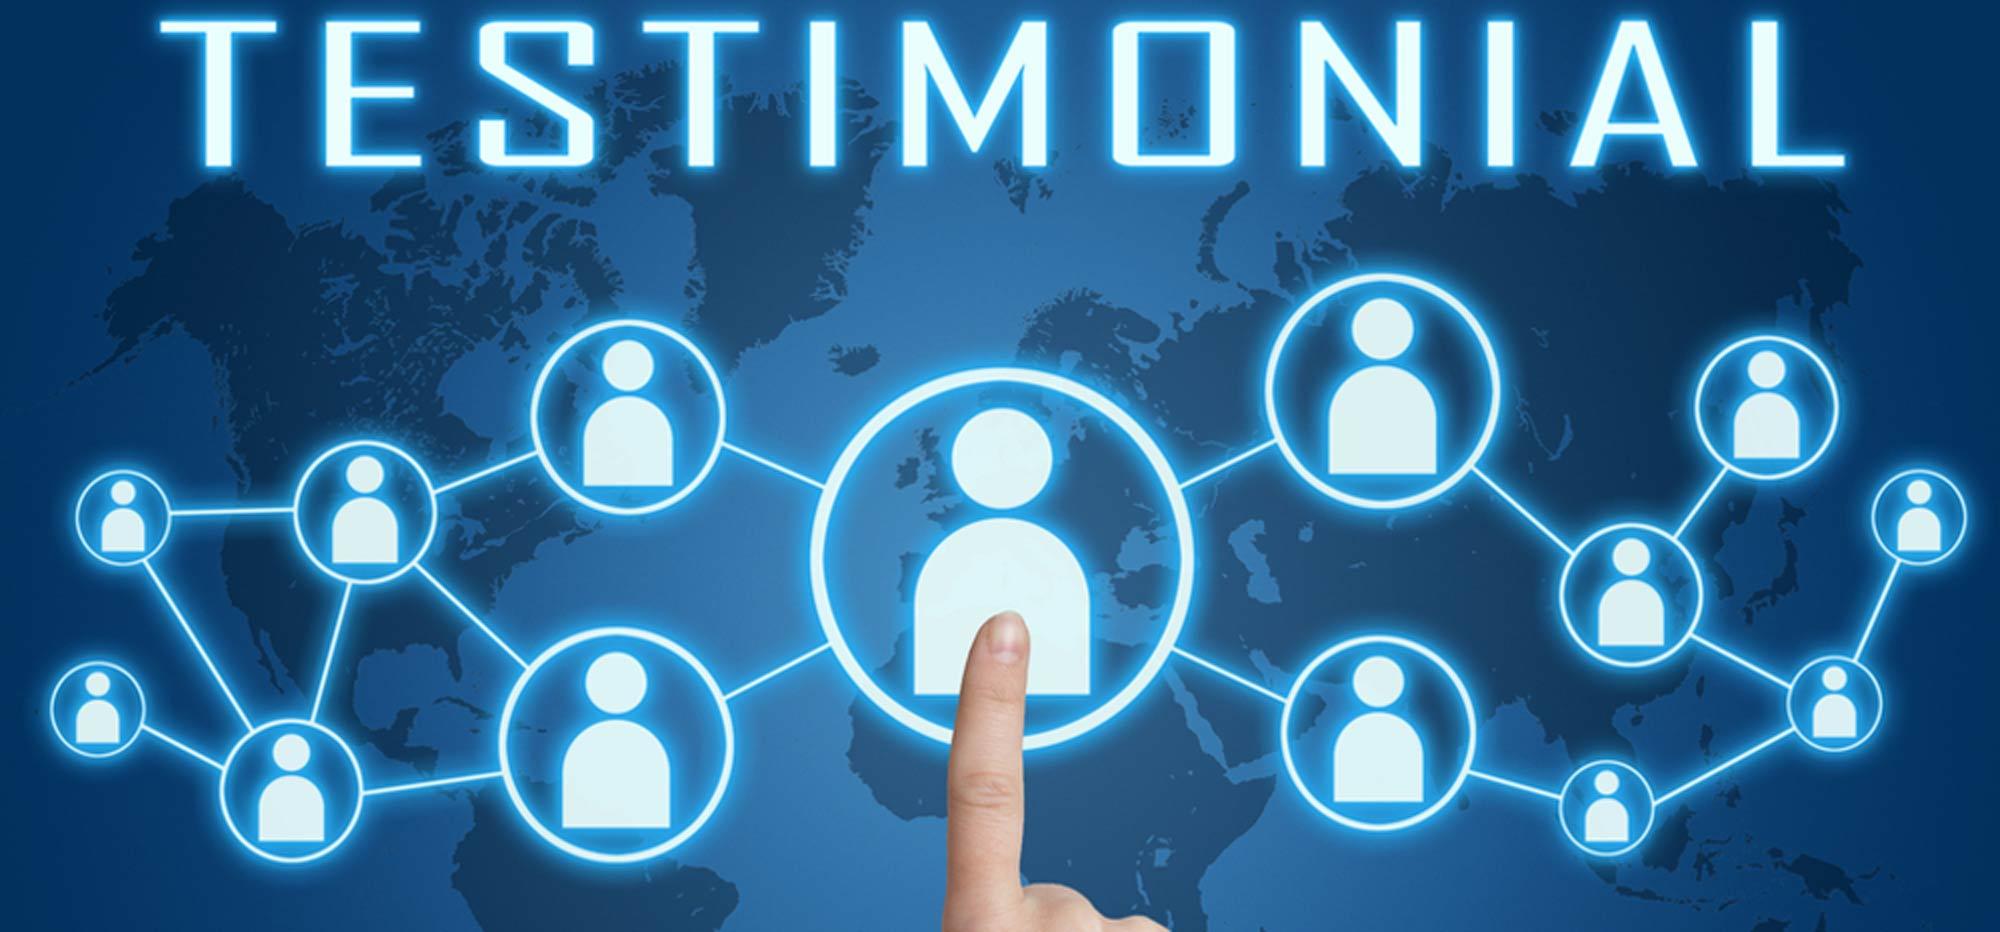 testimonials interim manager